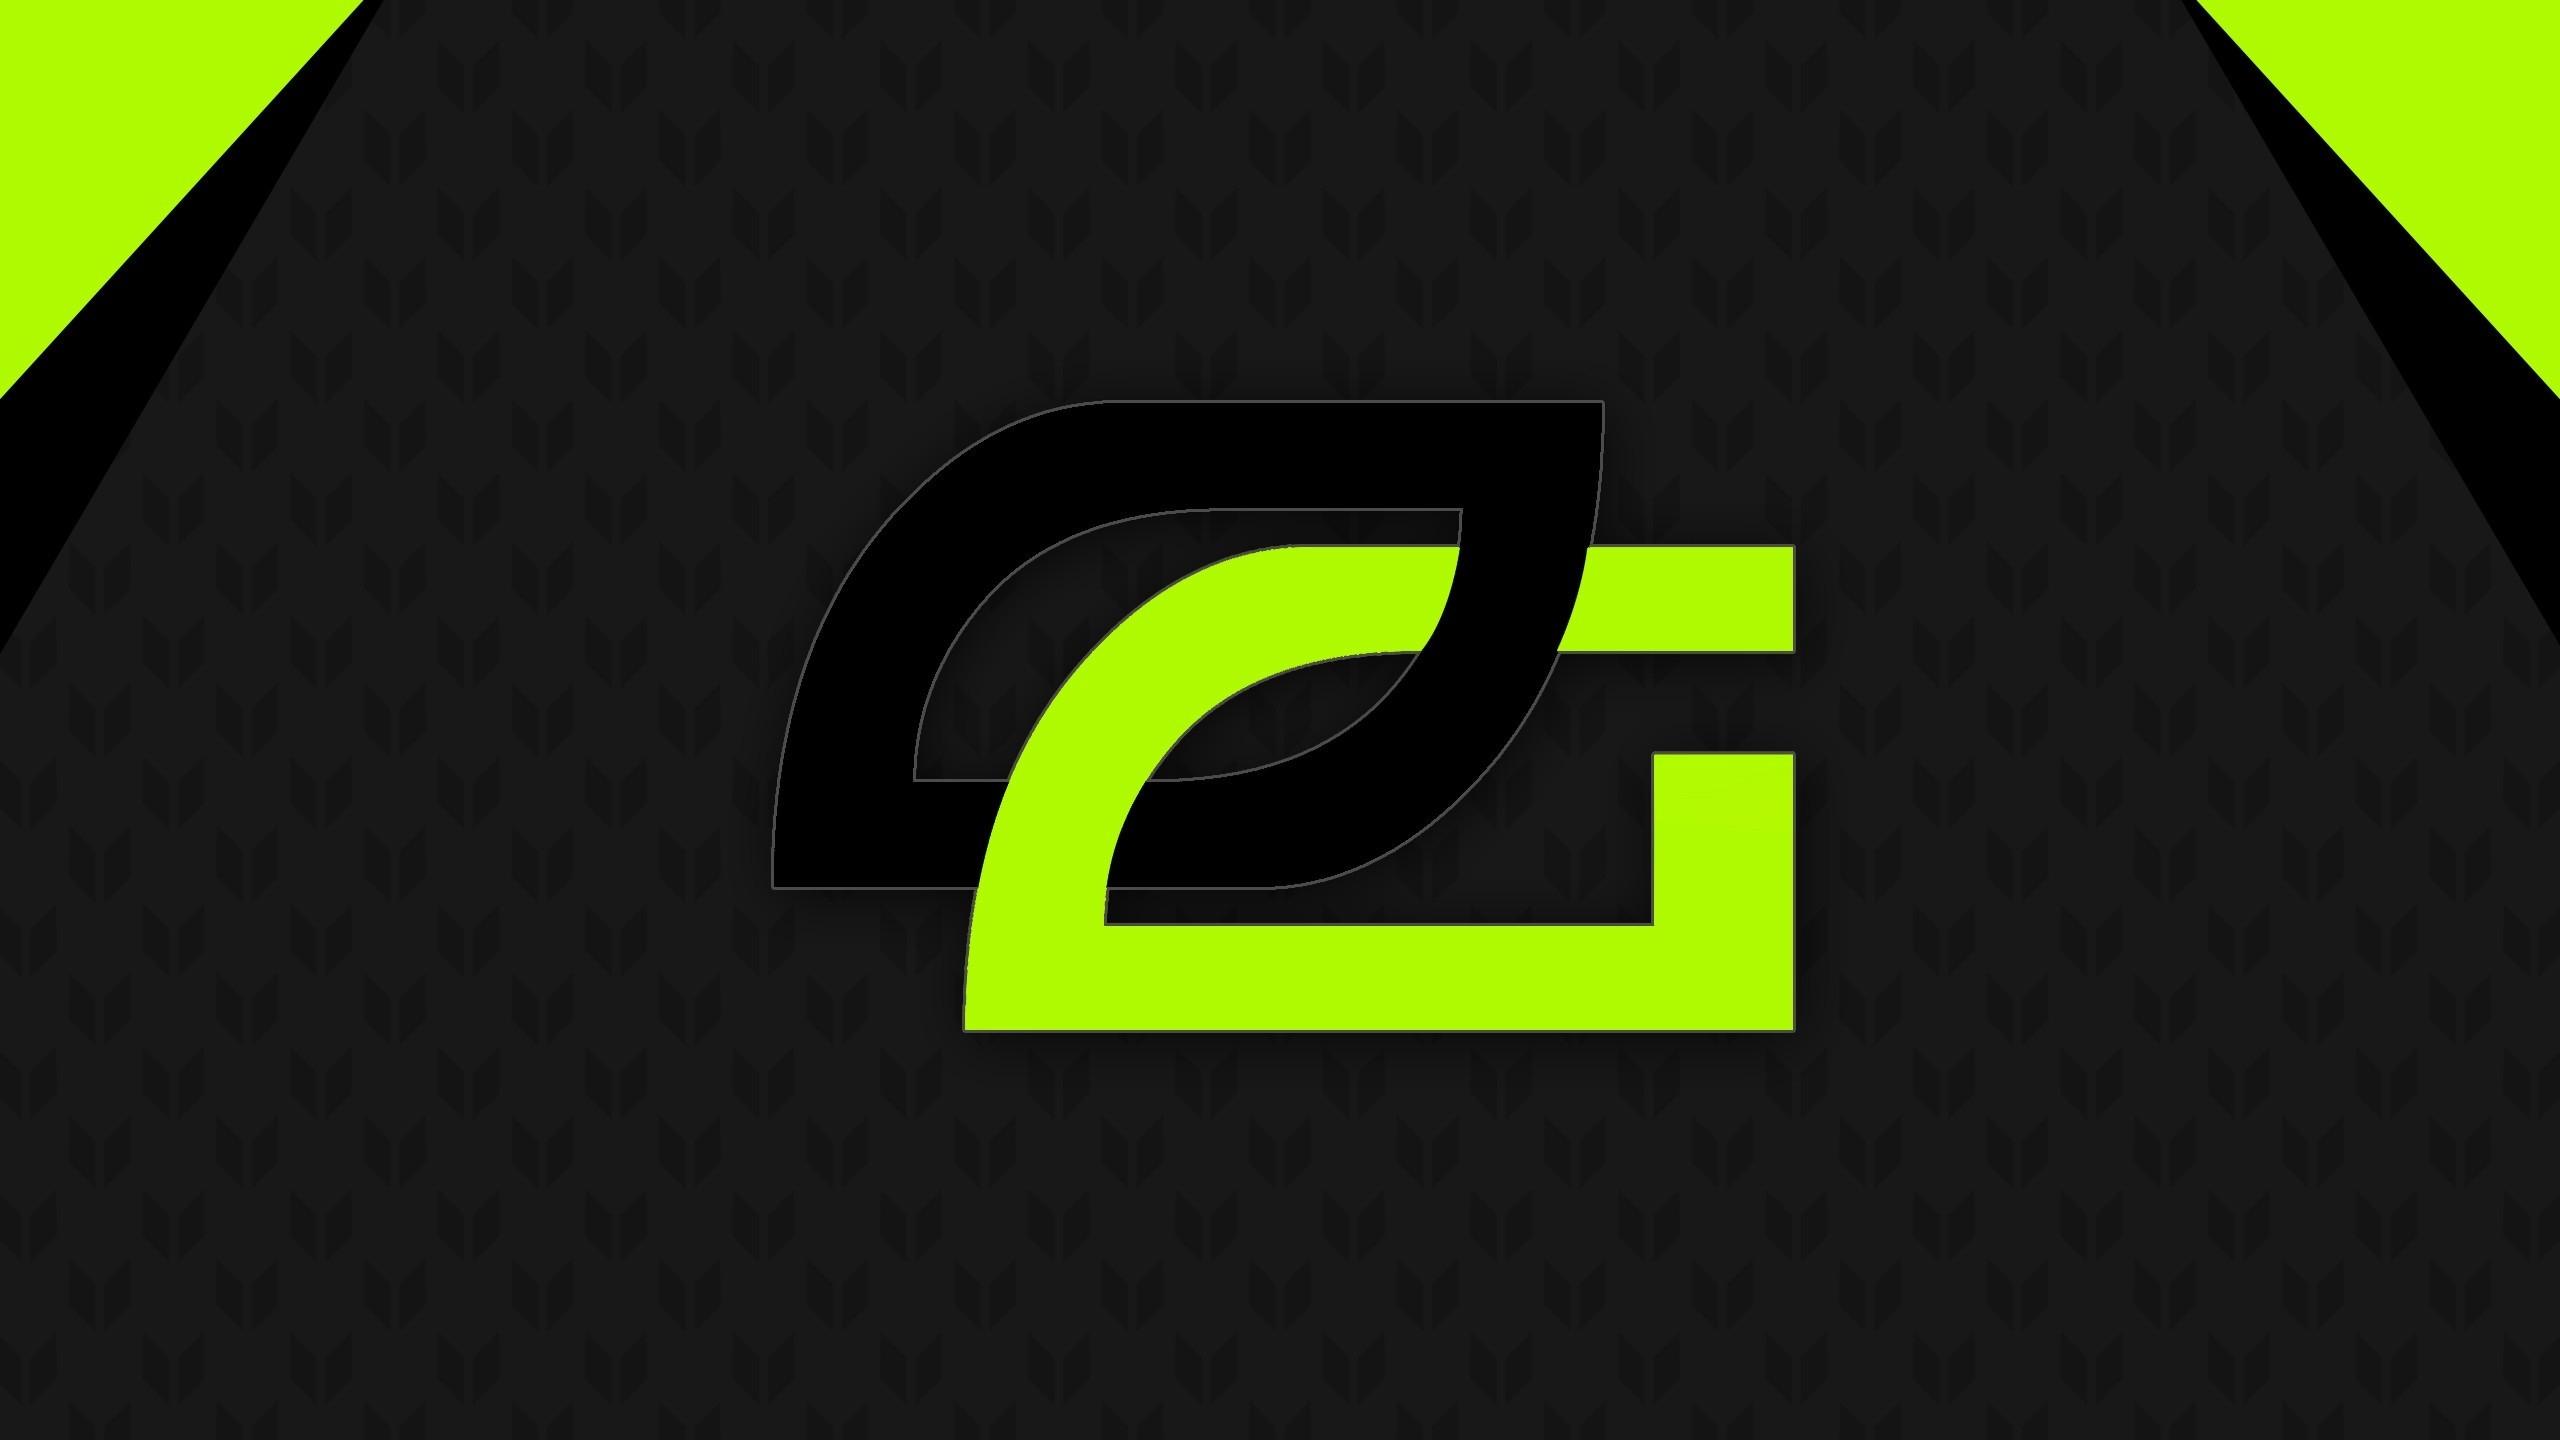 Optic Gaming Logo Wallpaper (81+ images).